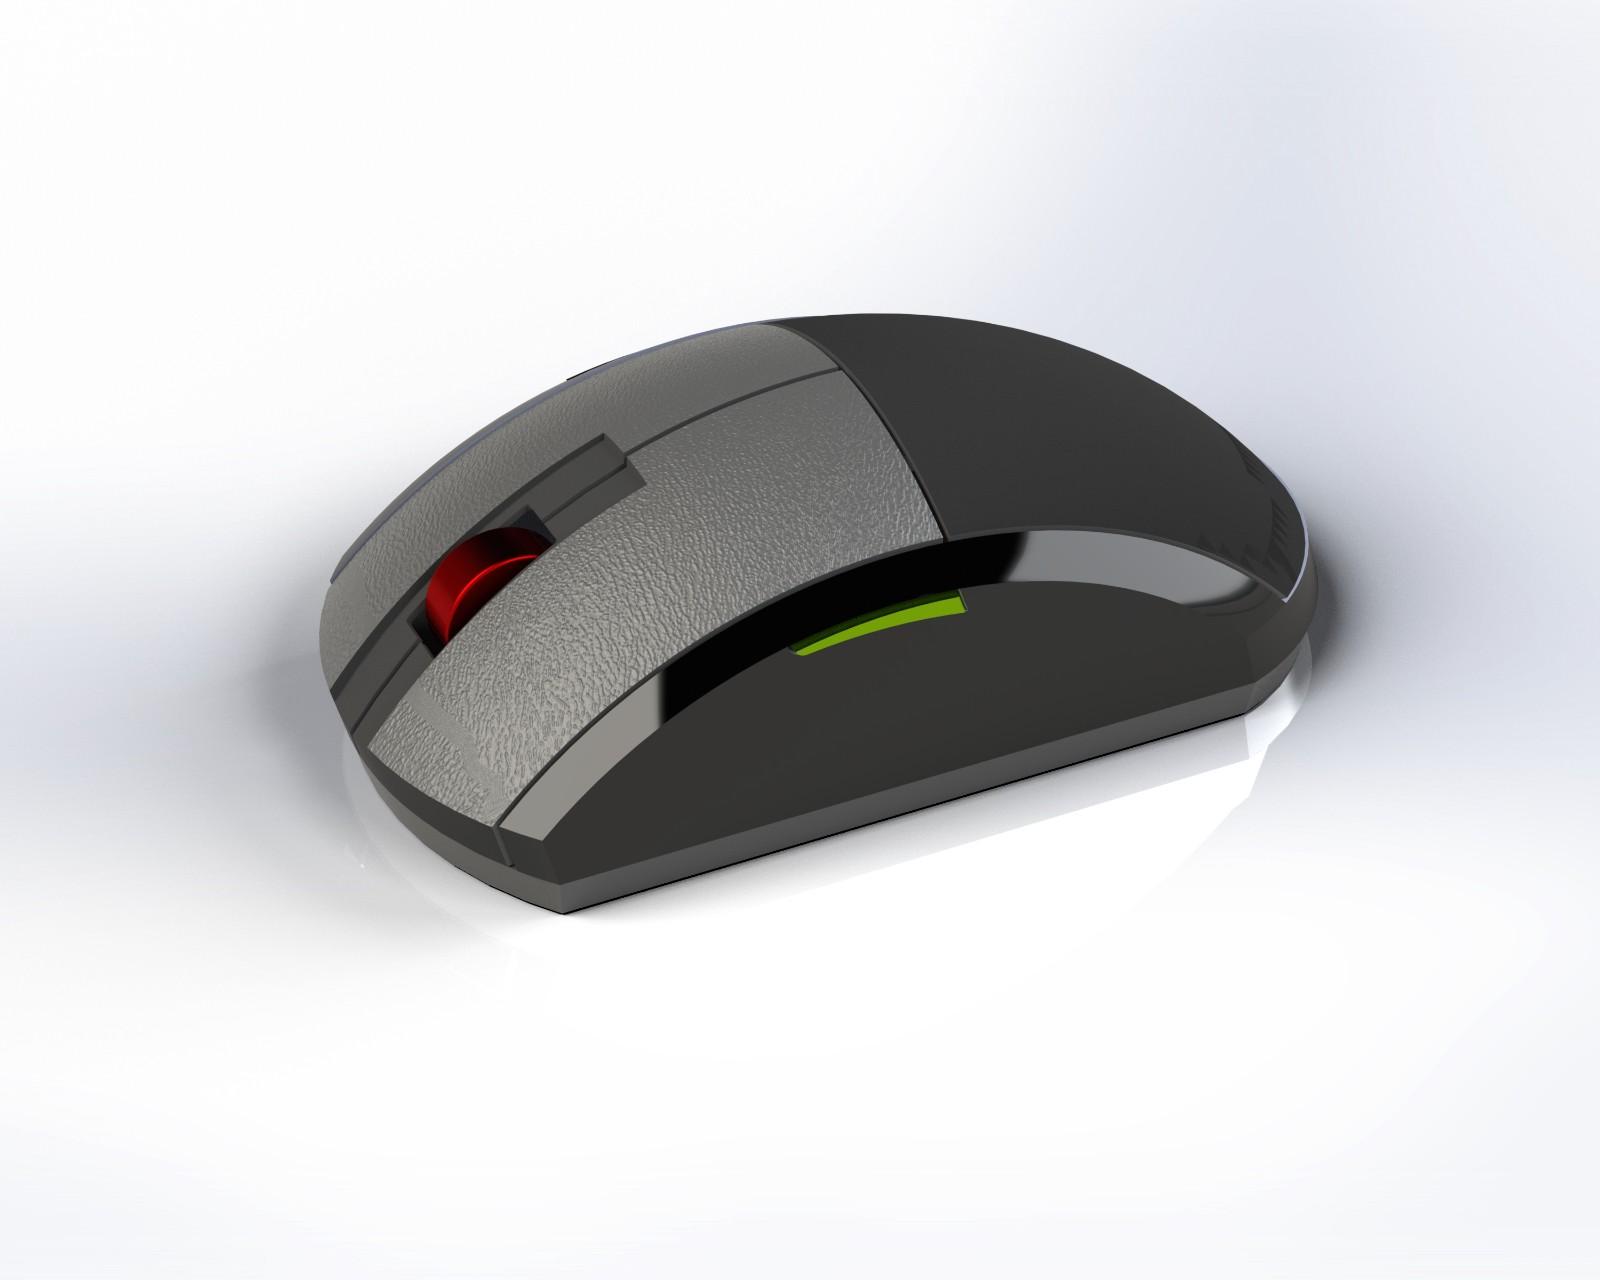 SolidWorks模型免费下载:鼠标